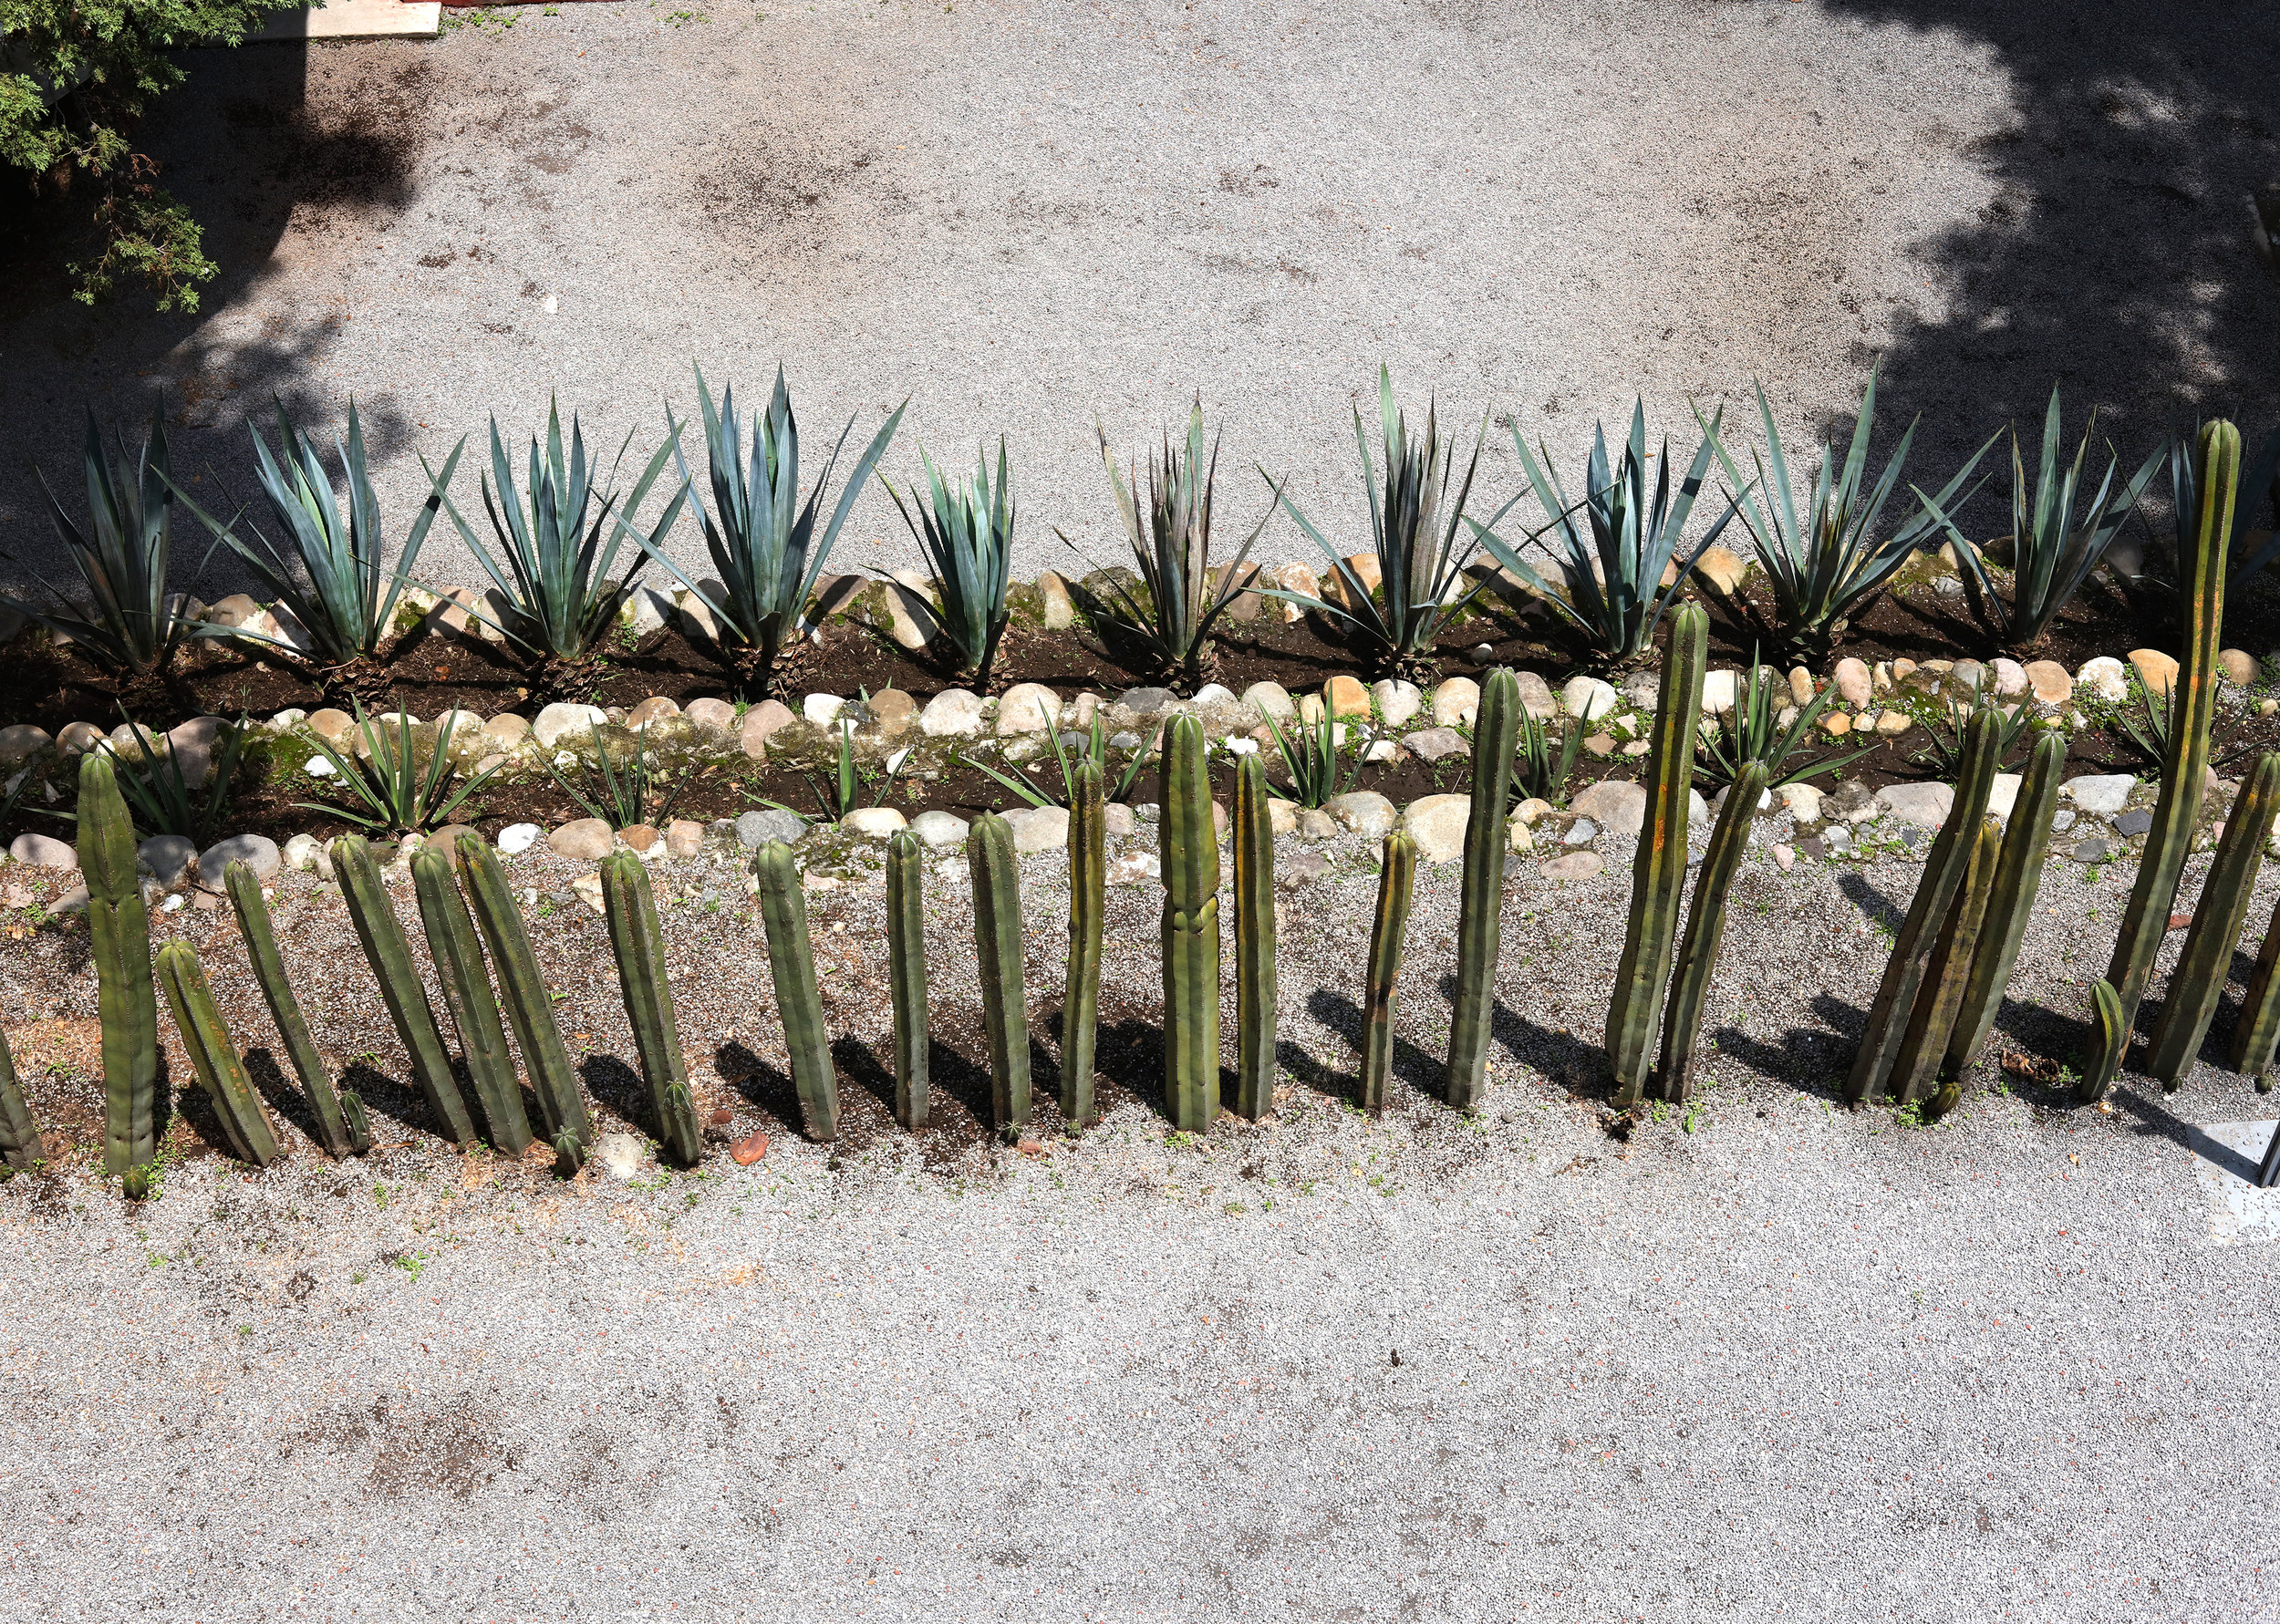 Garden Rows, Diego Rivera Studio